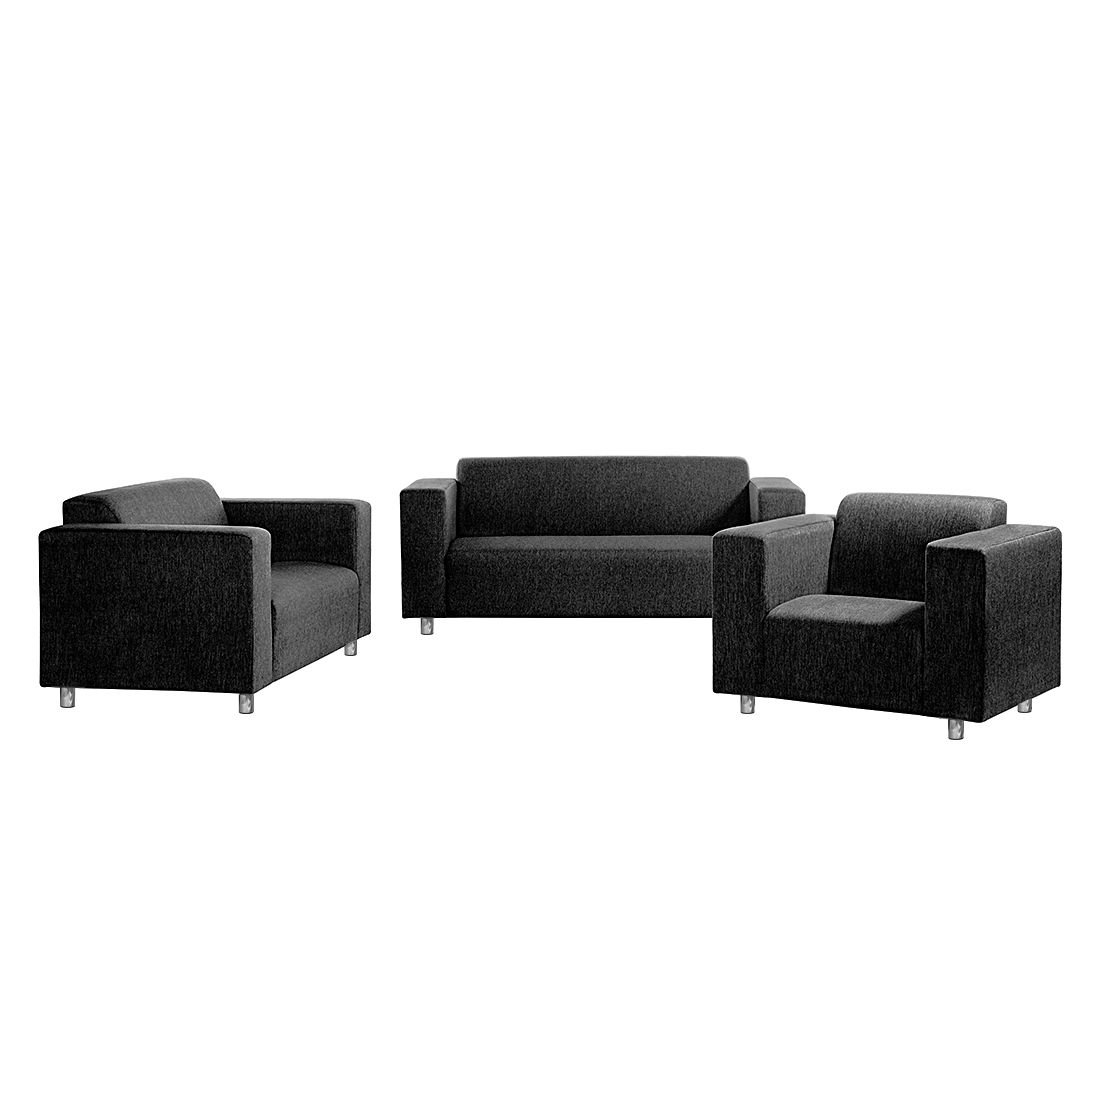 polstergarnitur oslo 3 2 1 strukturstoff anthrazit roomscape g nstig kaufen. Black Bedroom Furniture Sets. Home Design Ideas